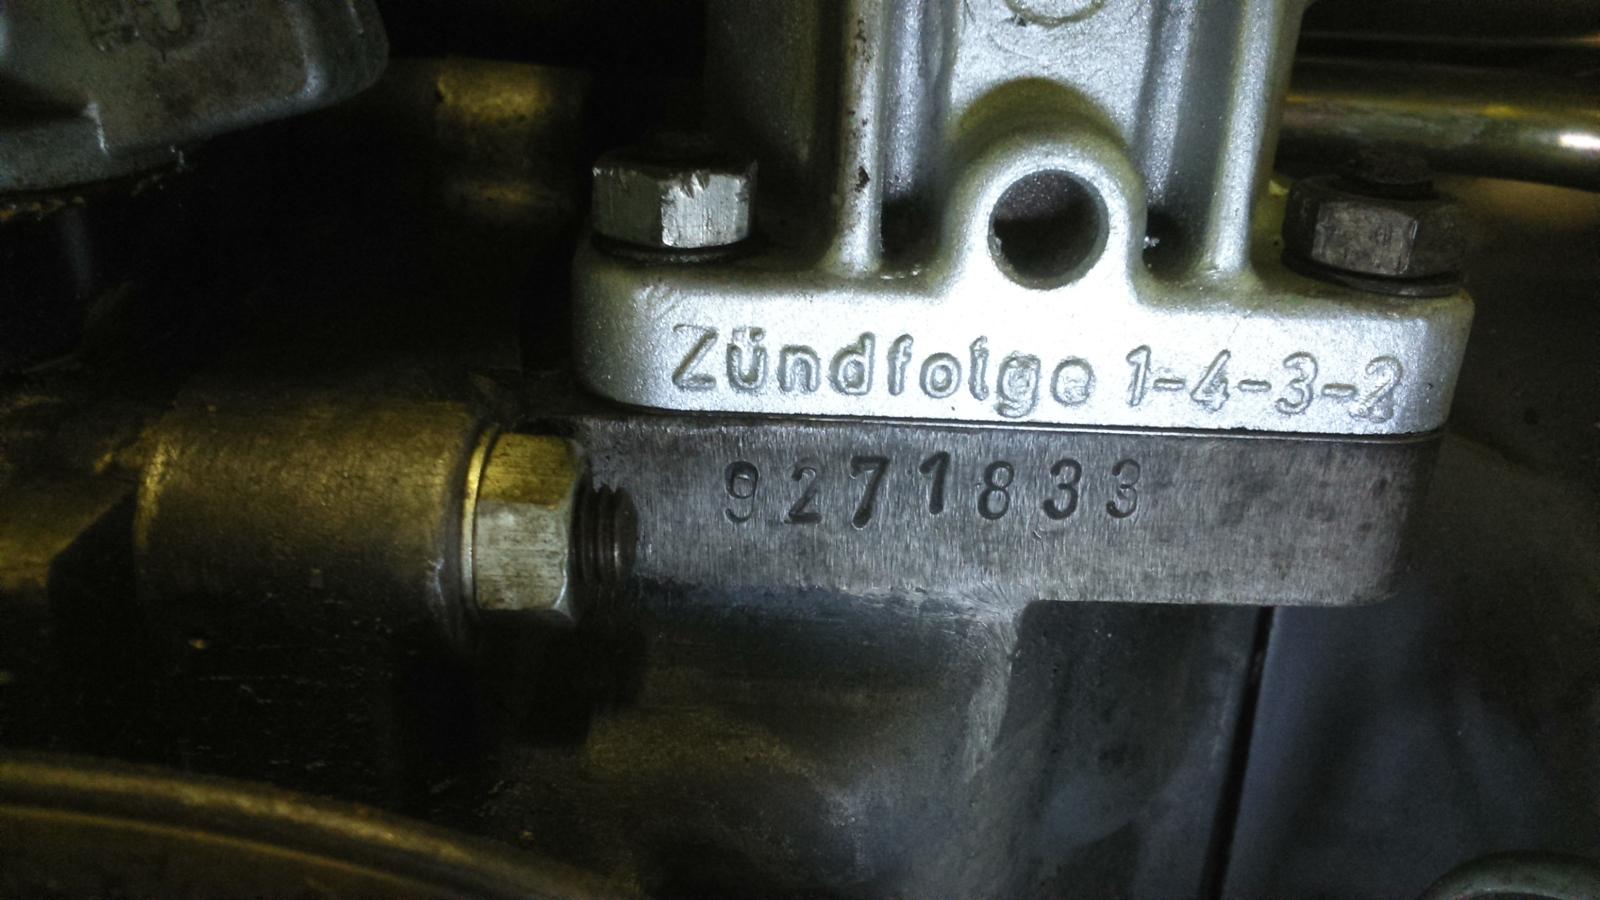 Lista de códigos de motores 2vnghly